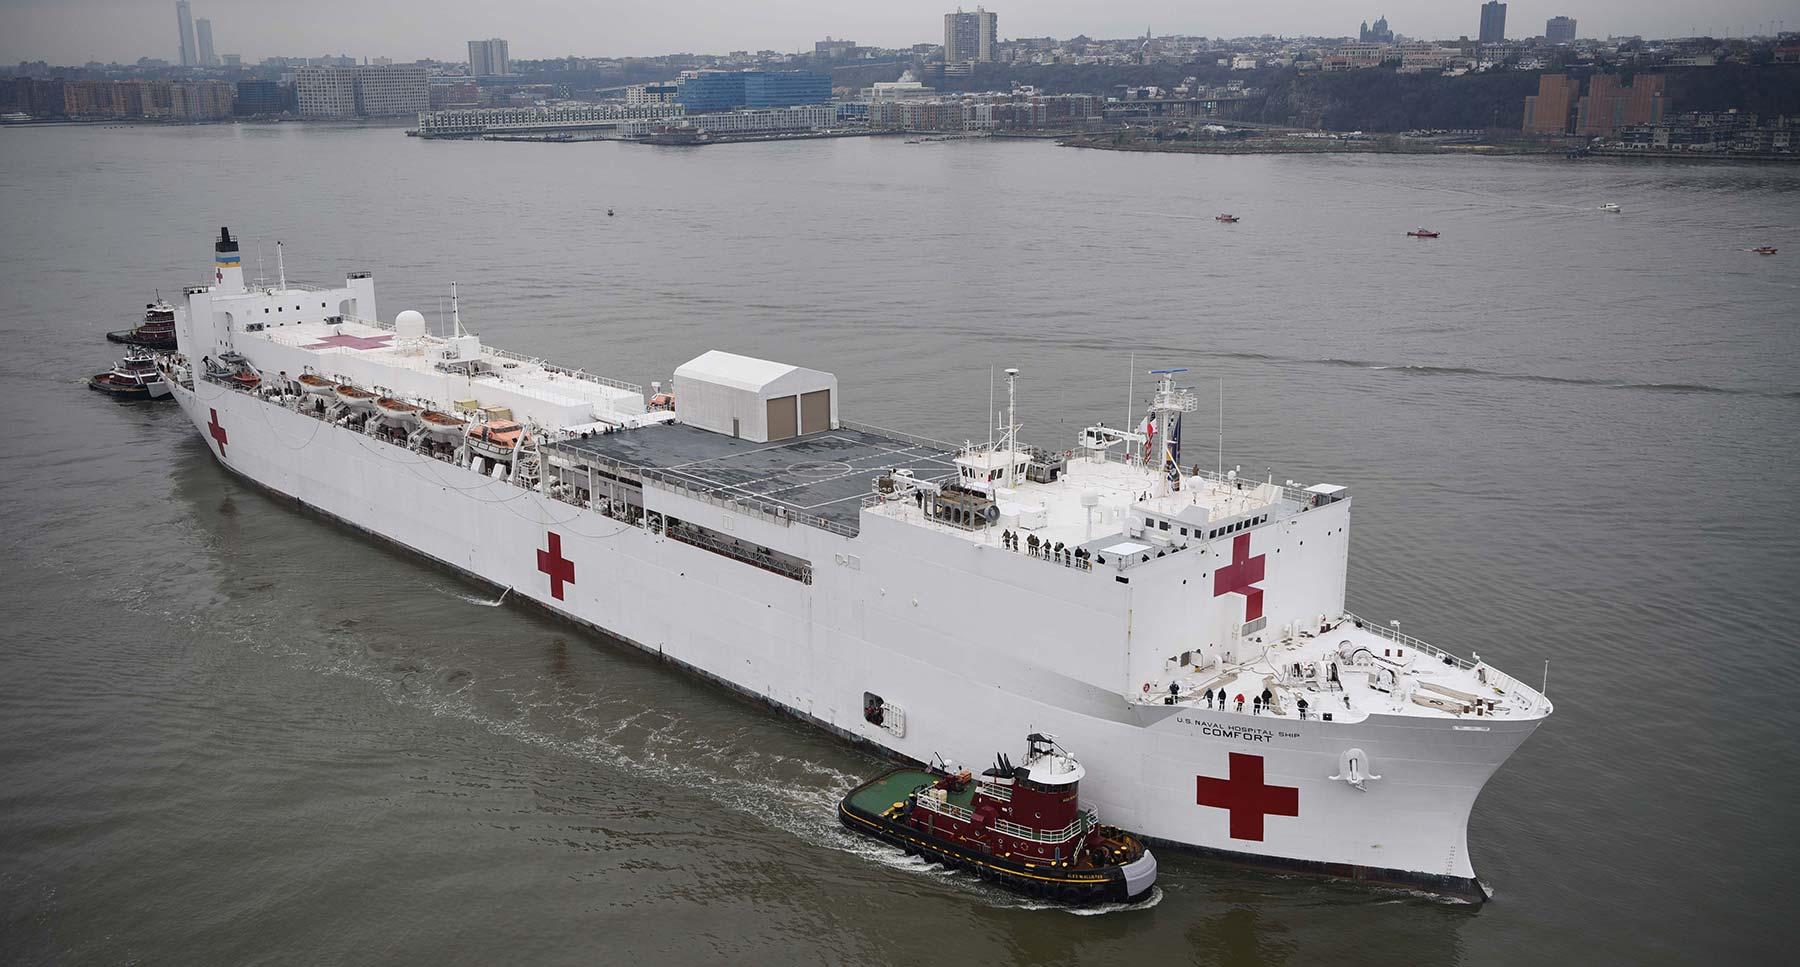 Hospital ship USNS Comfort New York